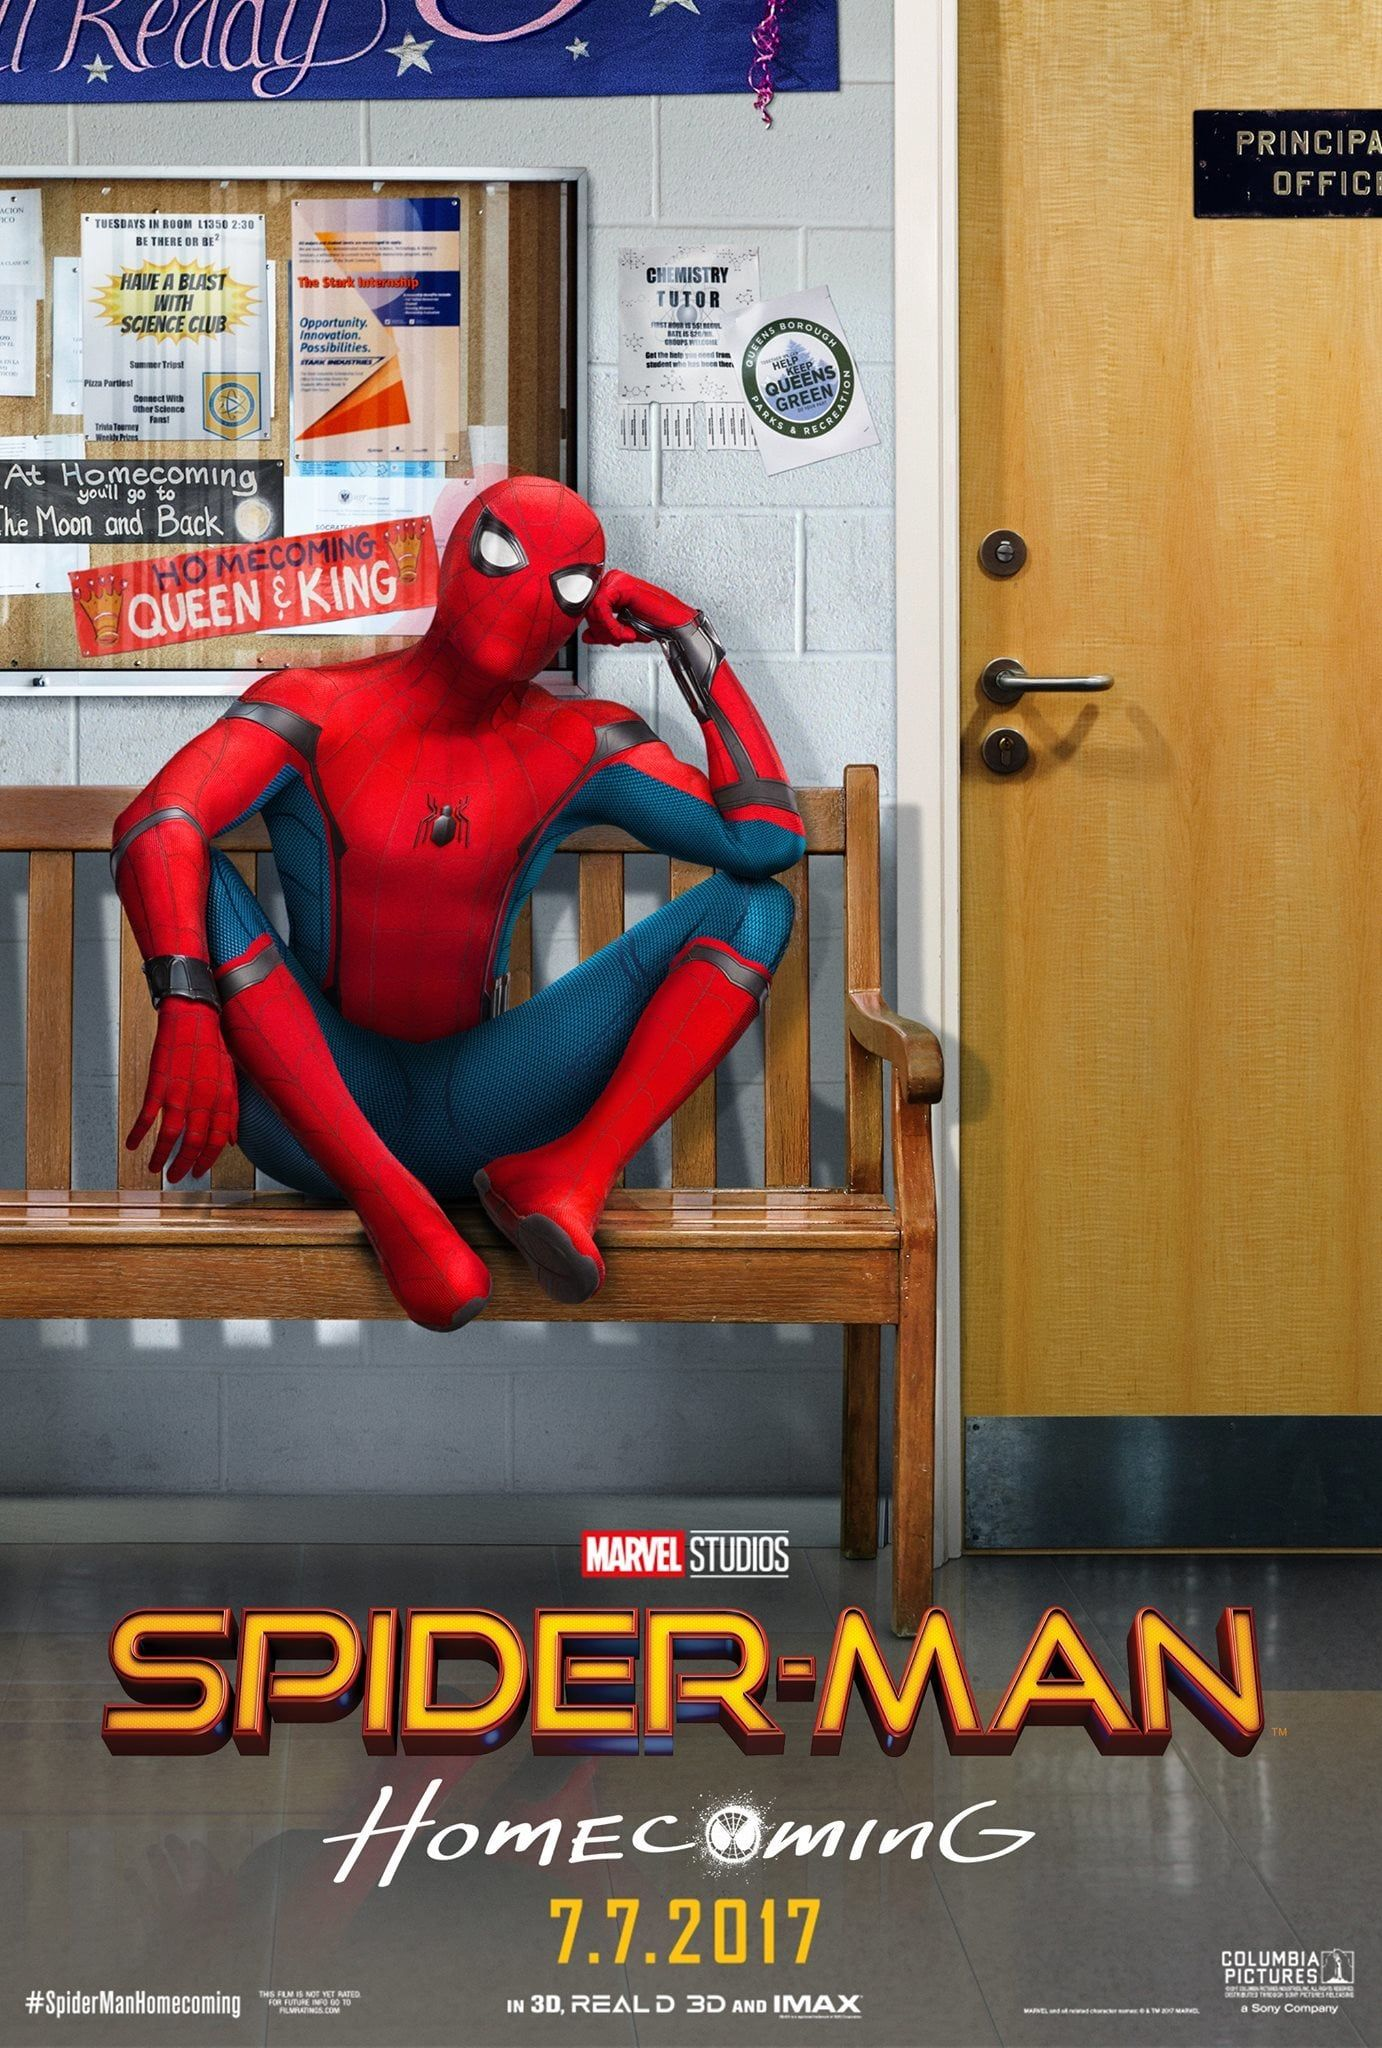 Spider Man Homecoming Pelicula Completa Peliculas De Spiderman Películas Completas Spider Man